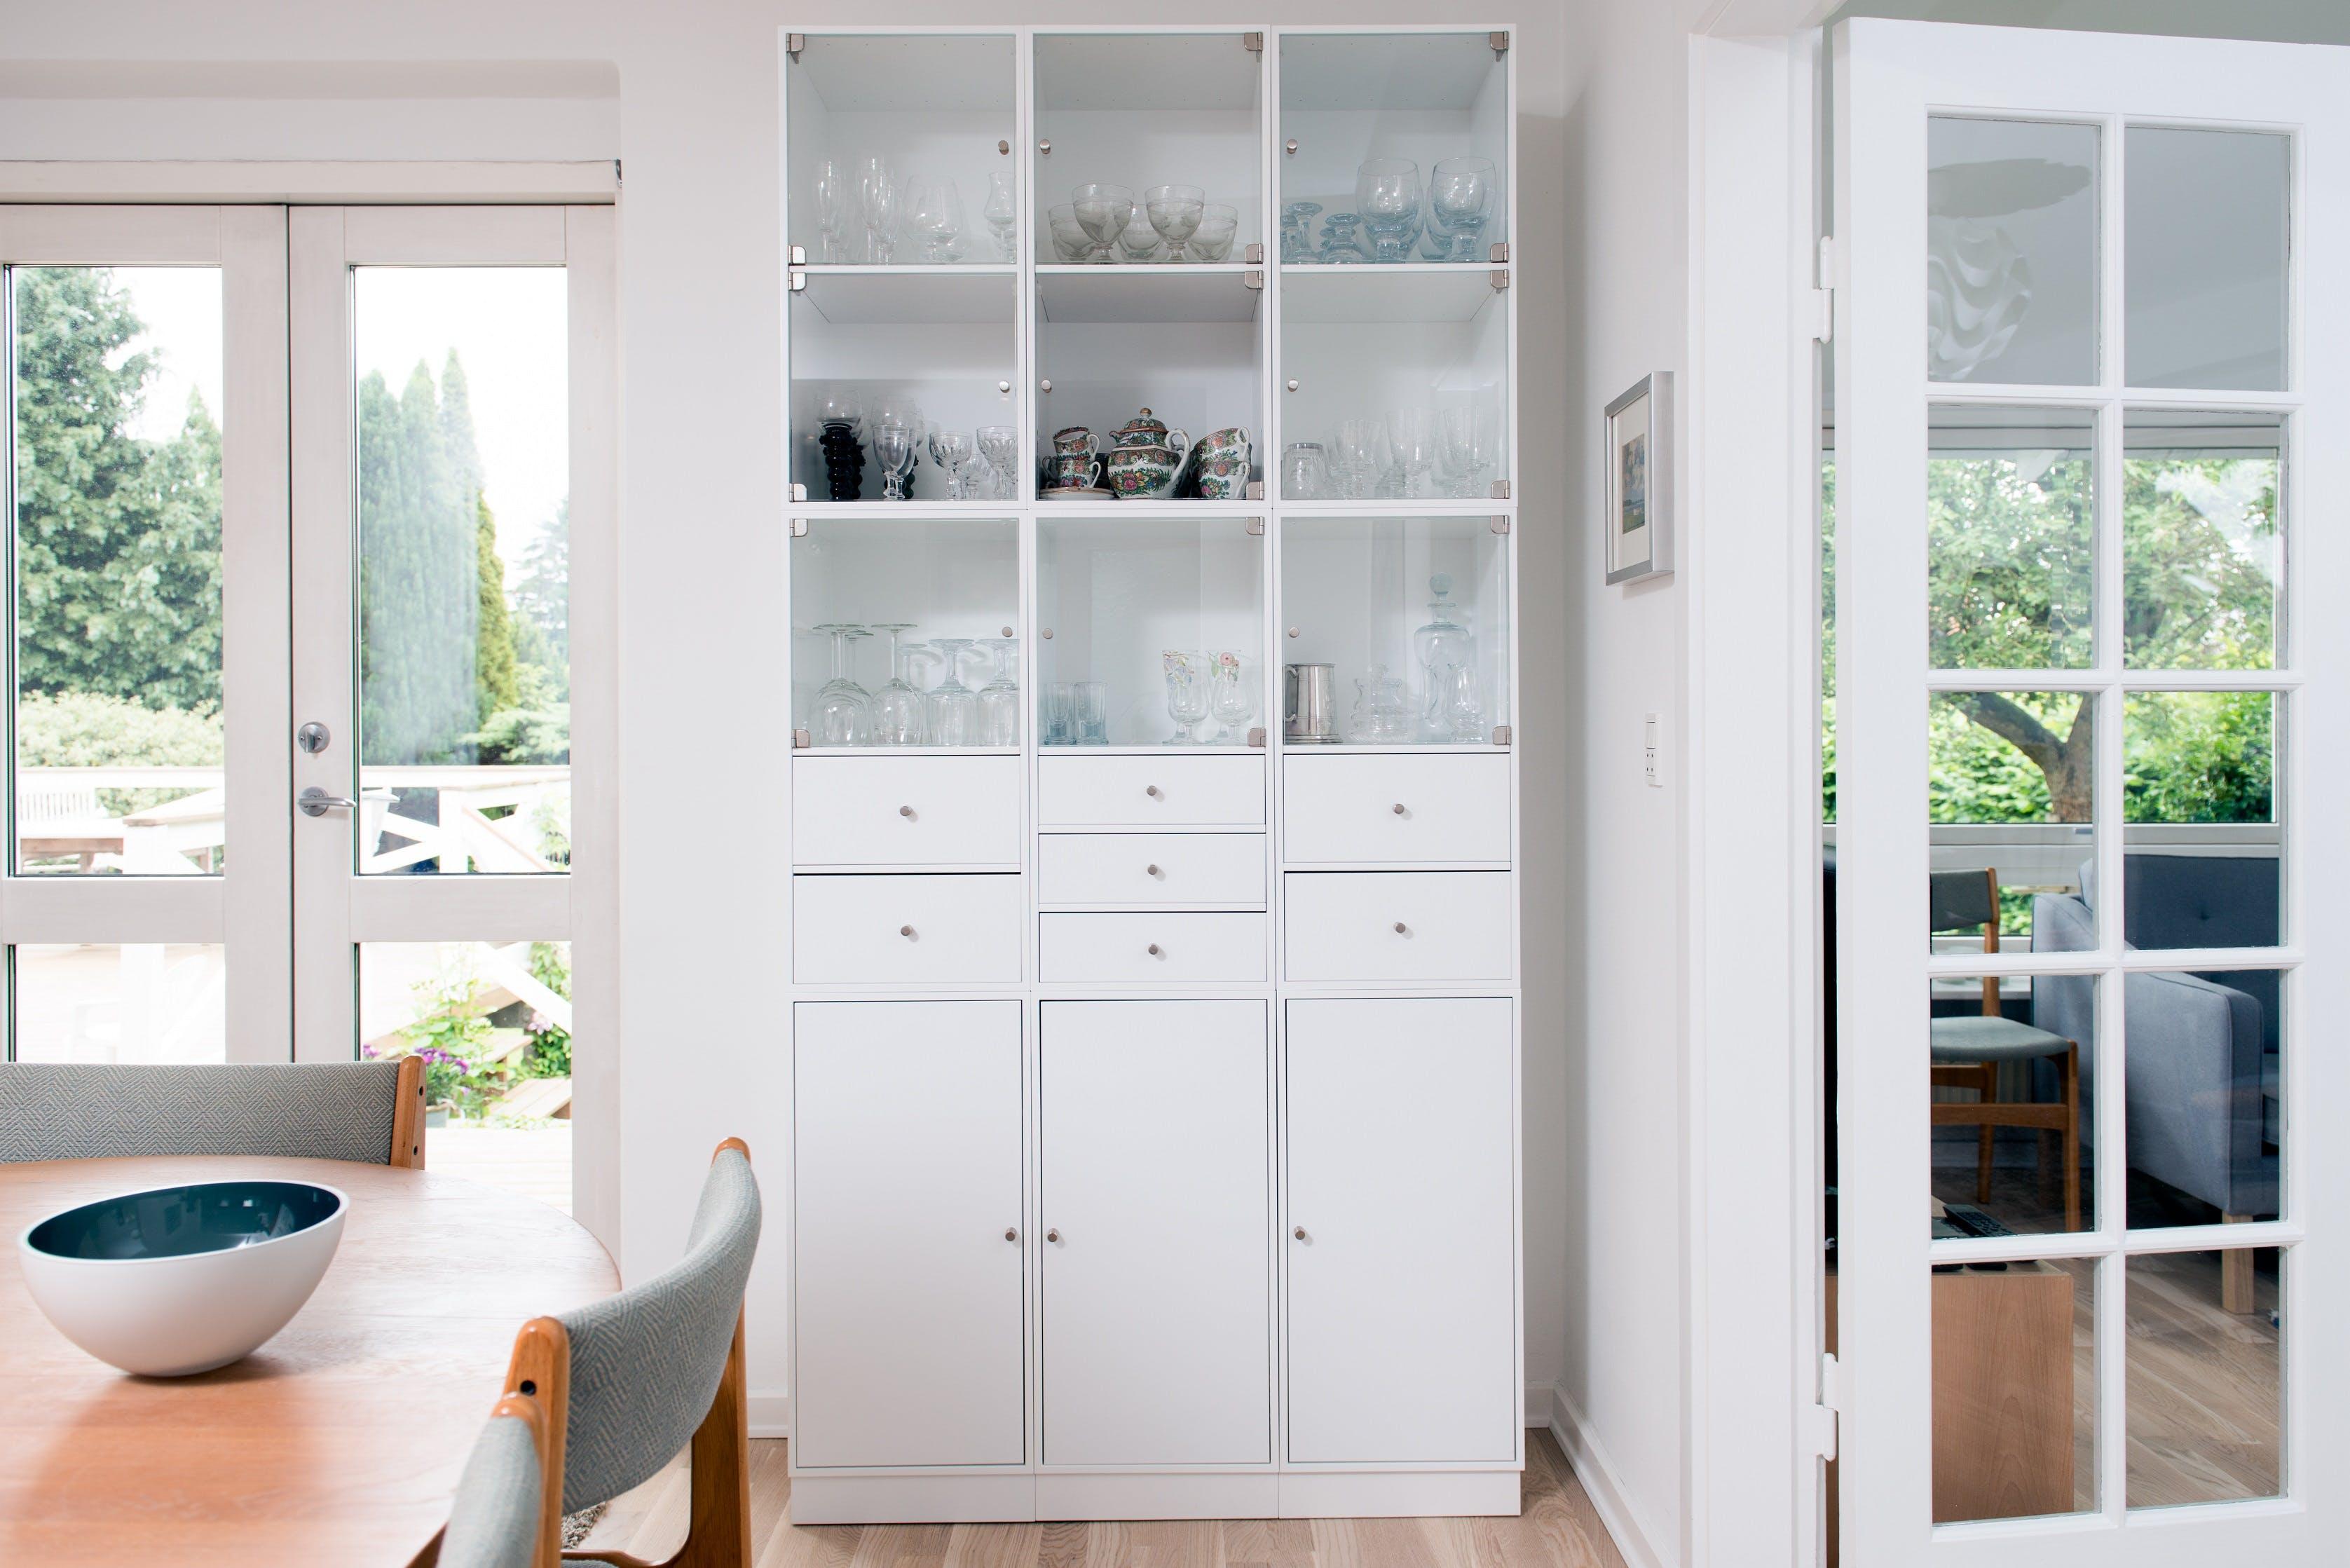 Free stock photo of table, cups, door, home